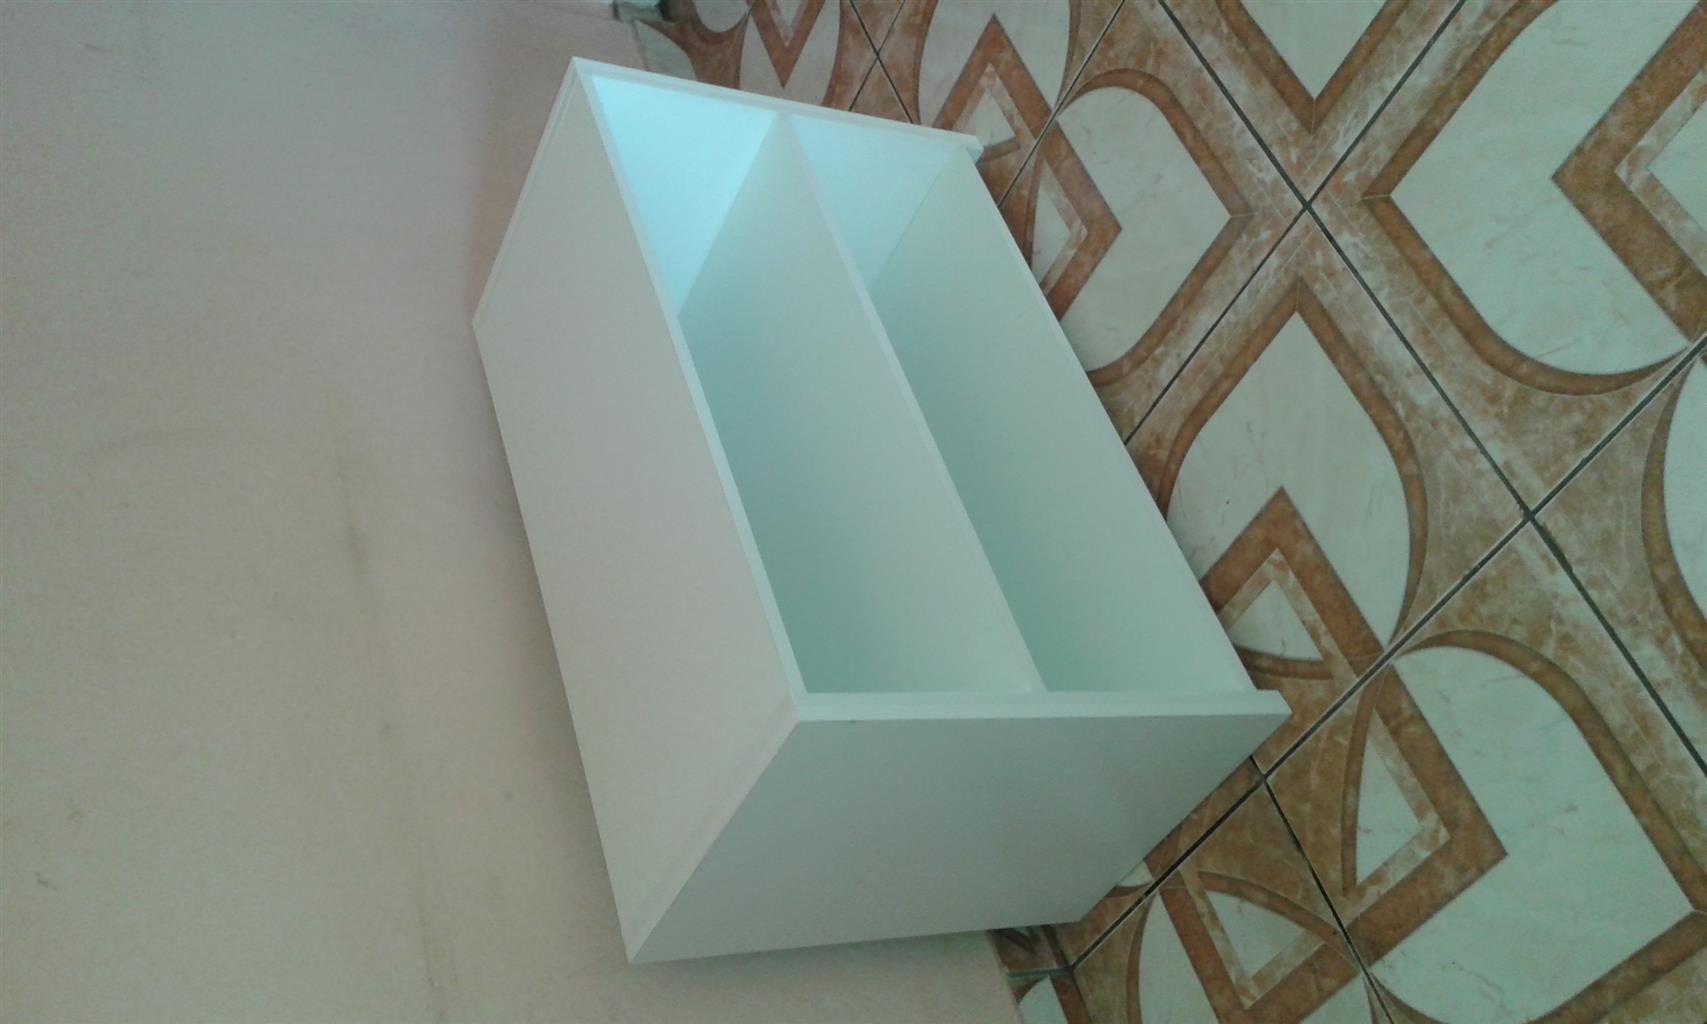 Designer unit pedestal headboard